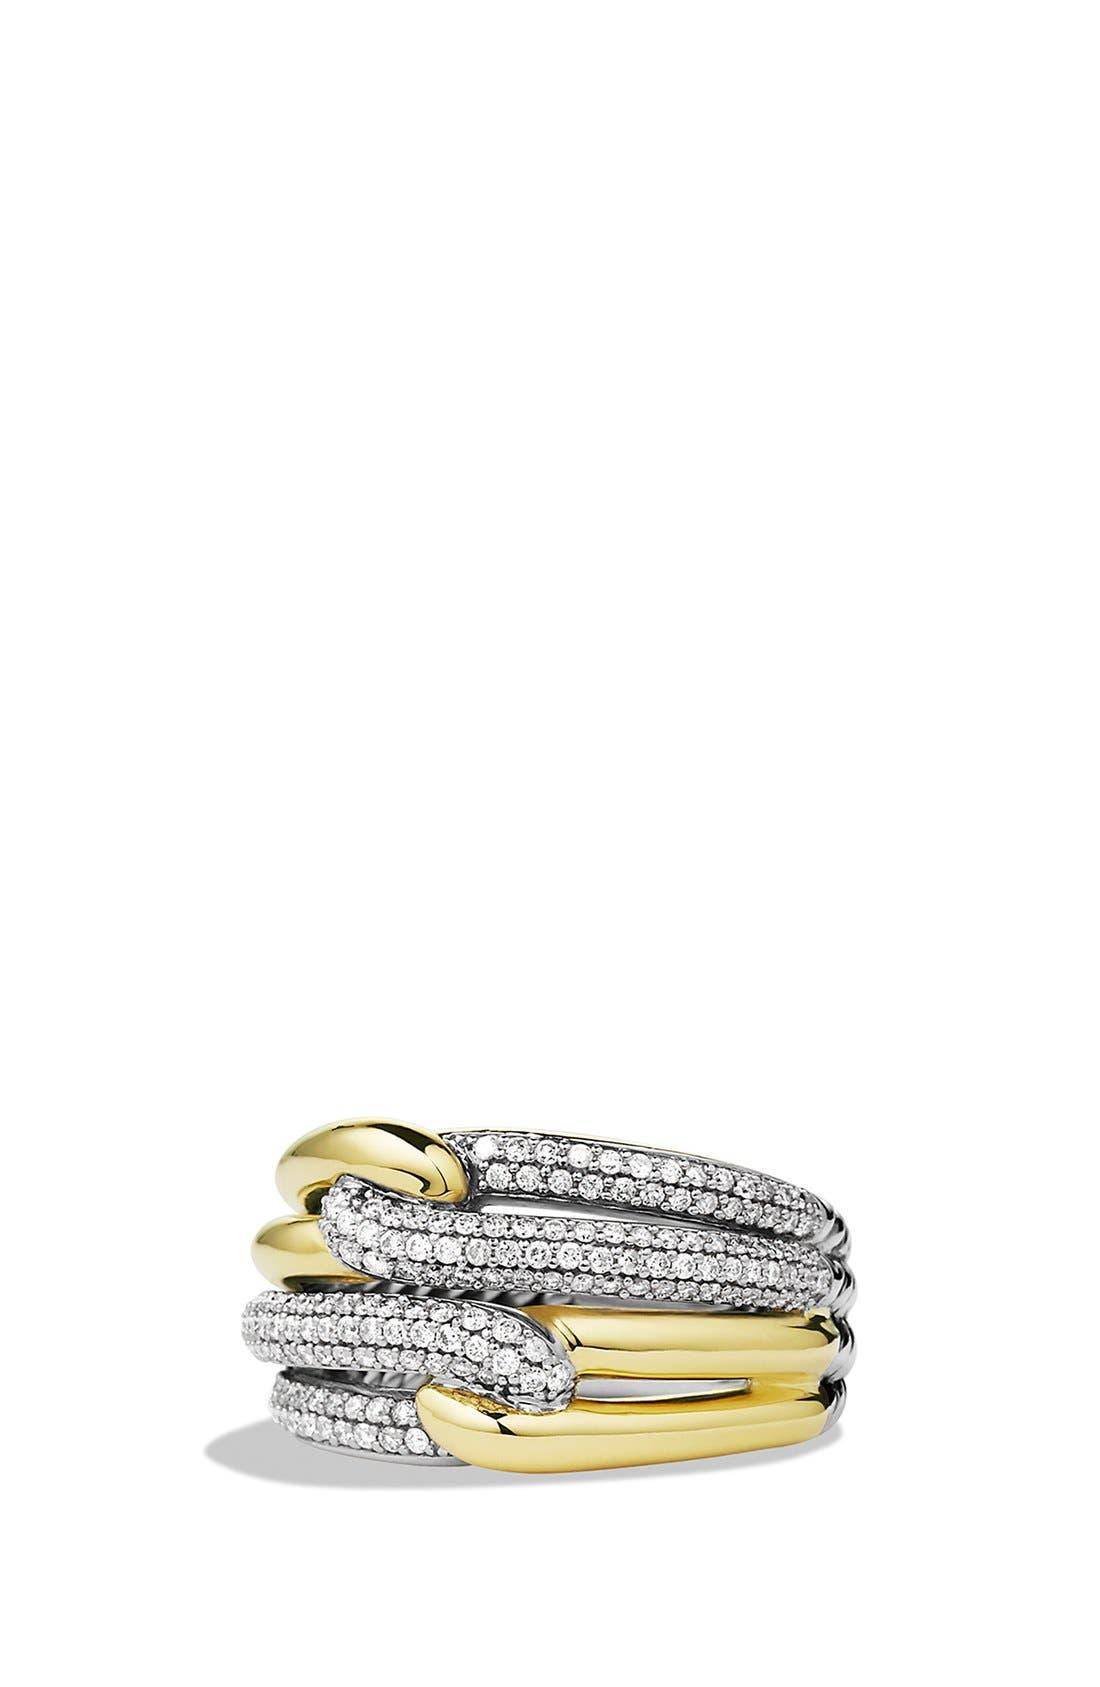 DAVID YURMAN 'Labyrinth' Double Loop Ring with Diamonds